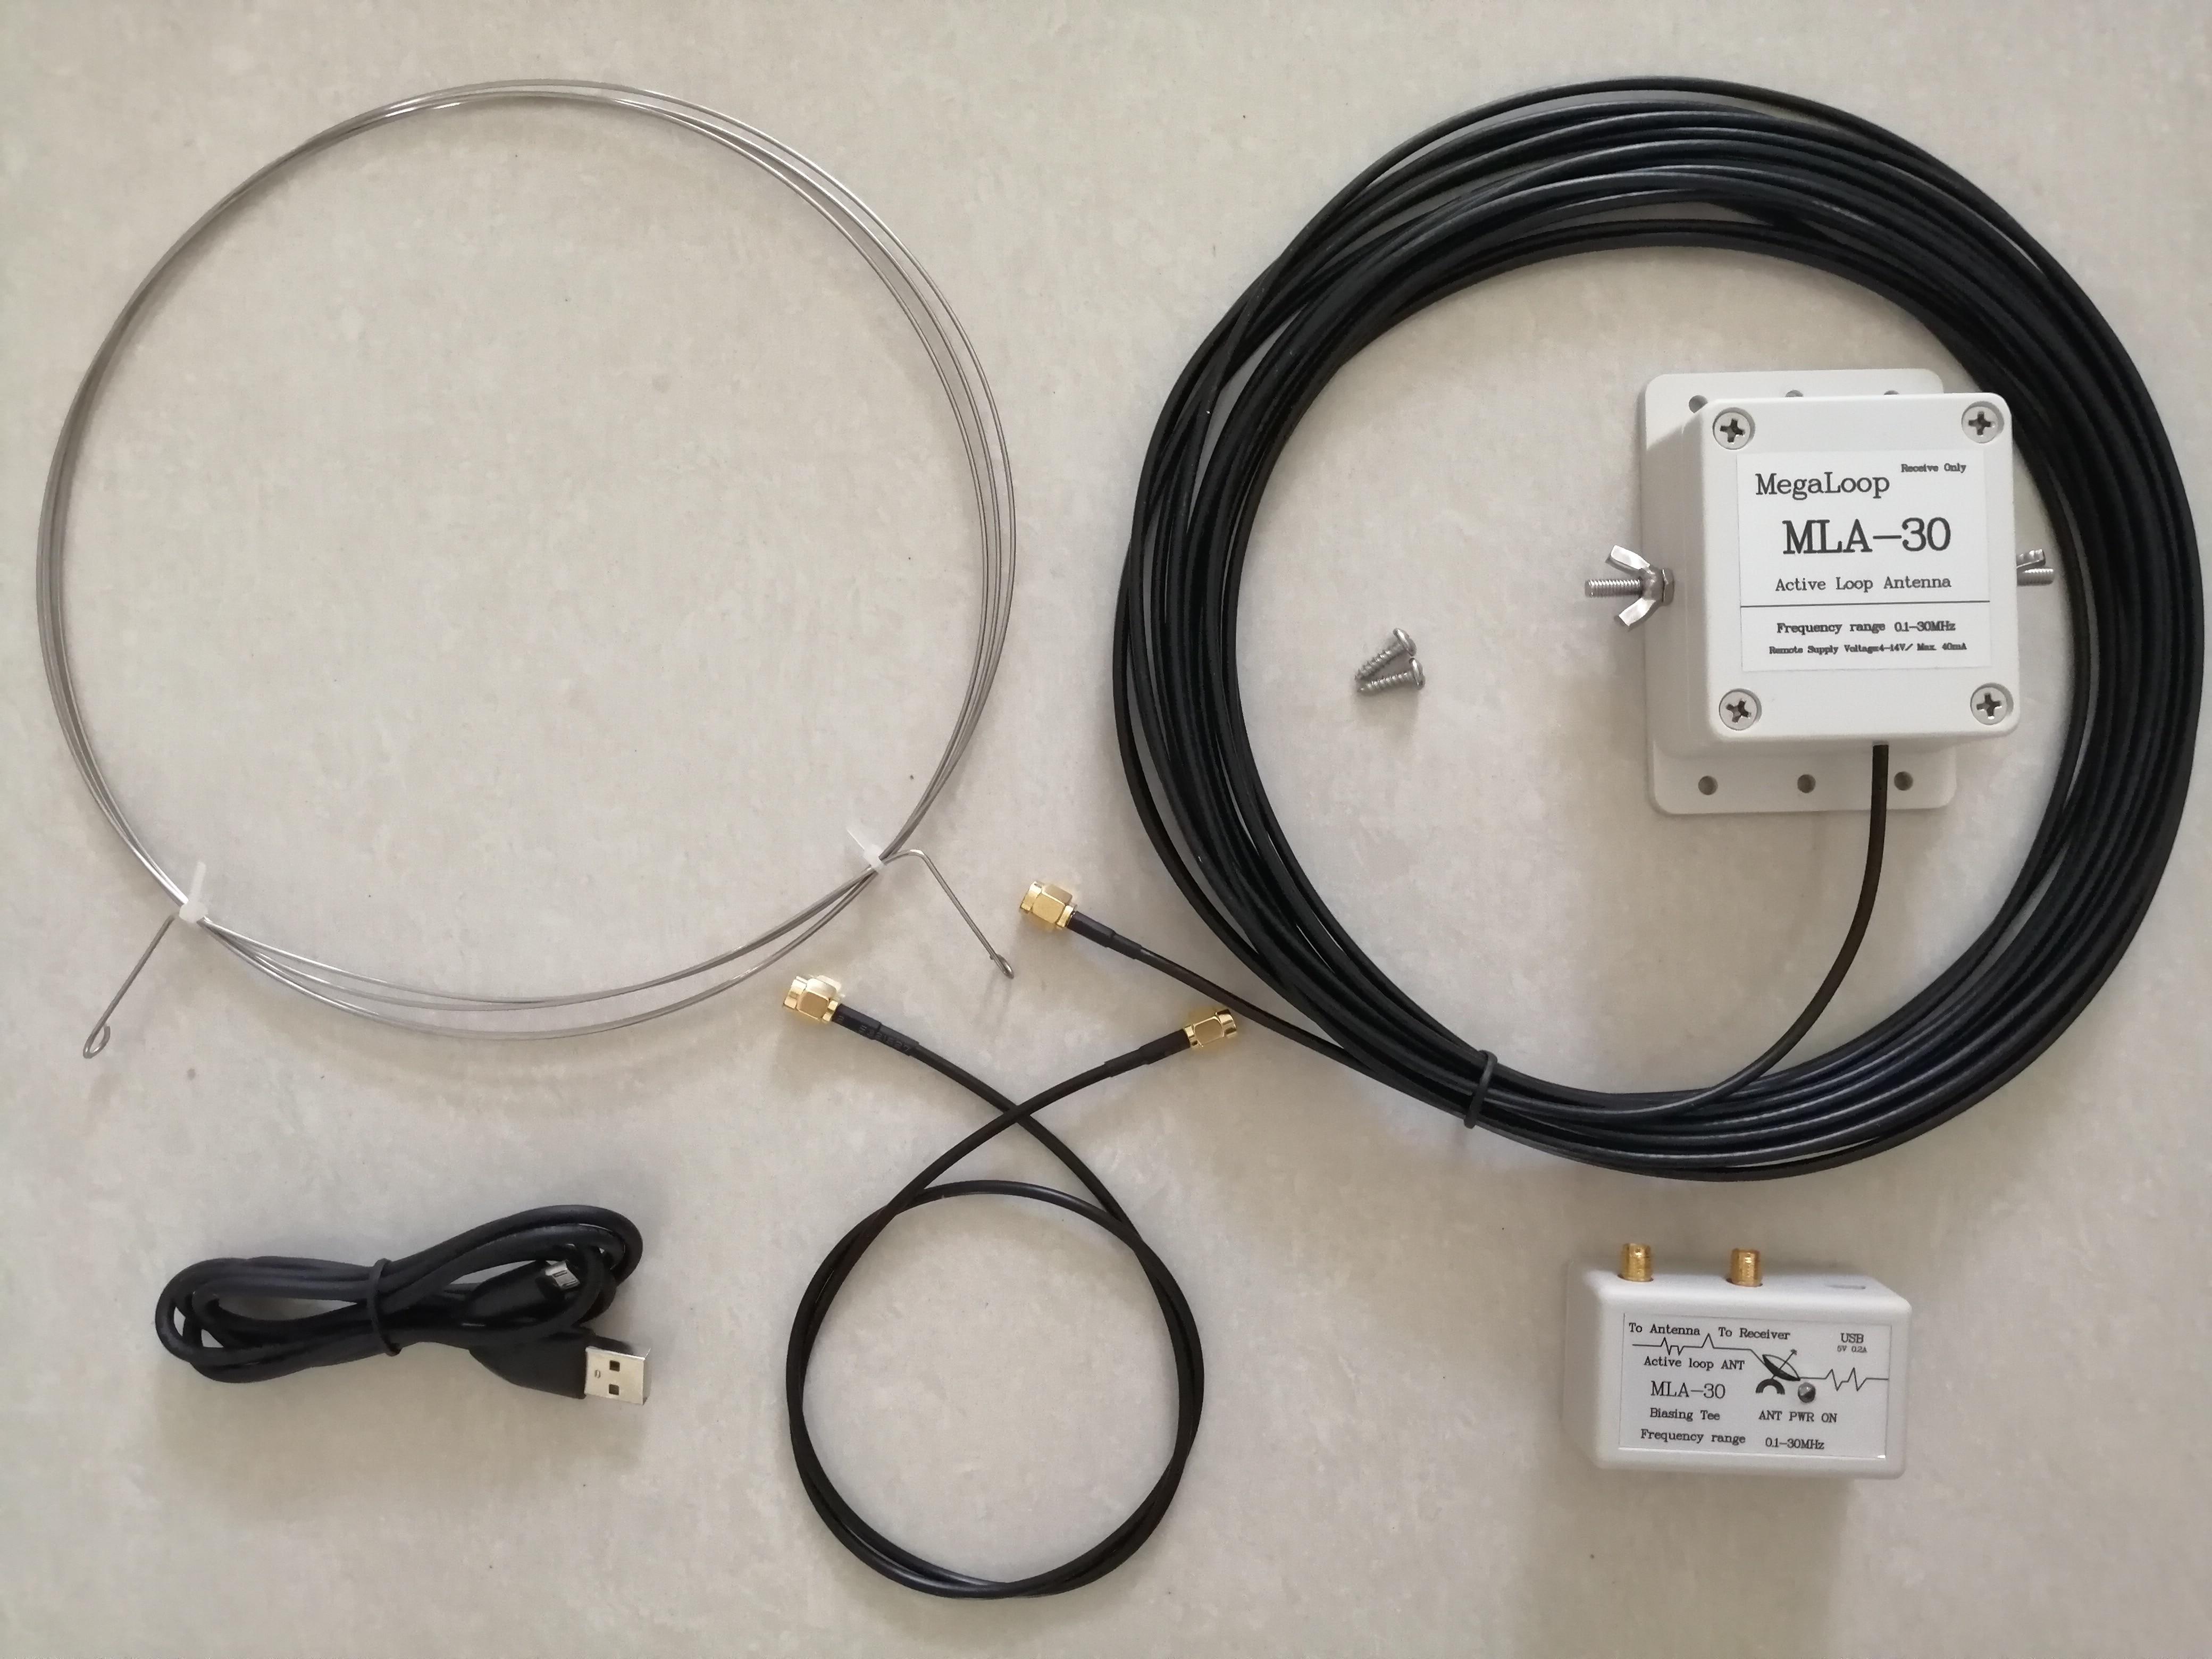 Free Shipping MLA-30 Active Loop Antenna Active Receiving Antenna 100KHz-30MHz For Medium Wave Shortwave HF Radio